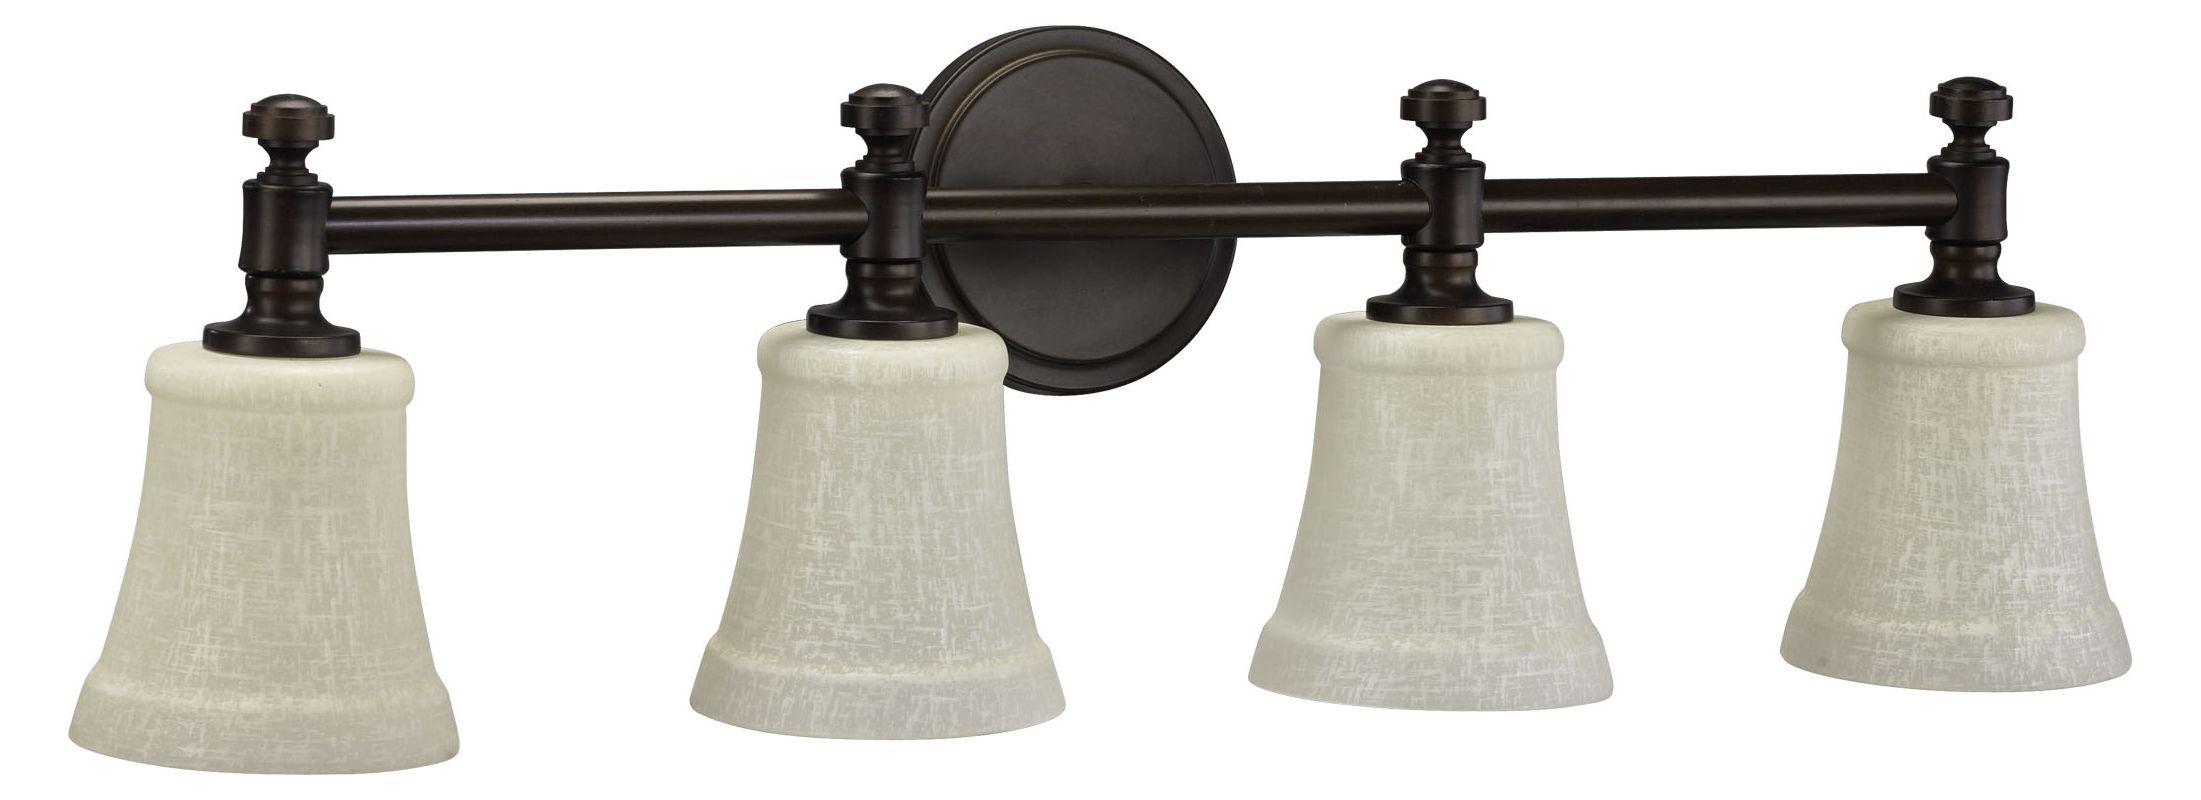 Quorum International 5122-4-86 Oiled Bronze Four Light 30